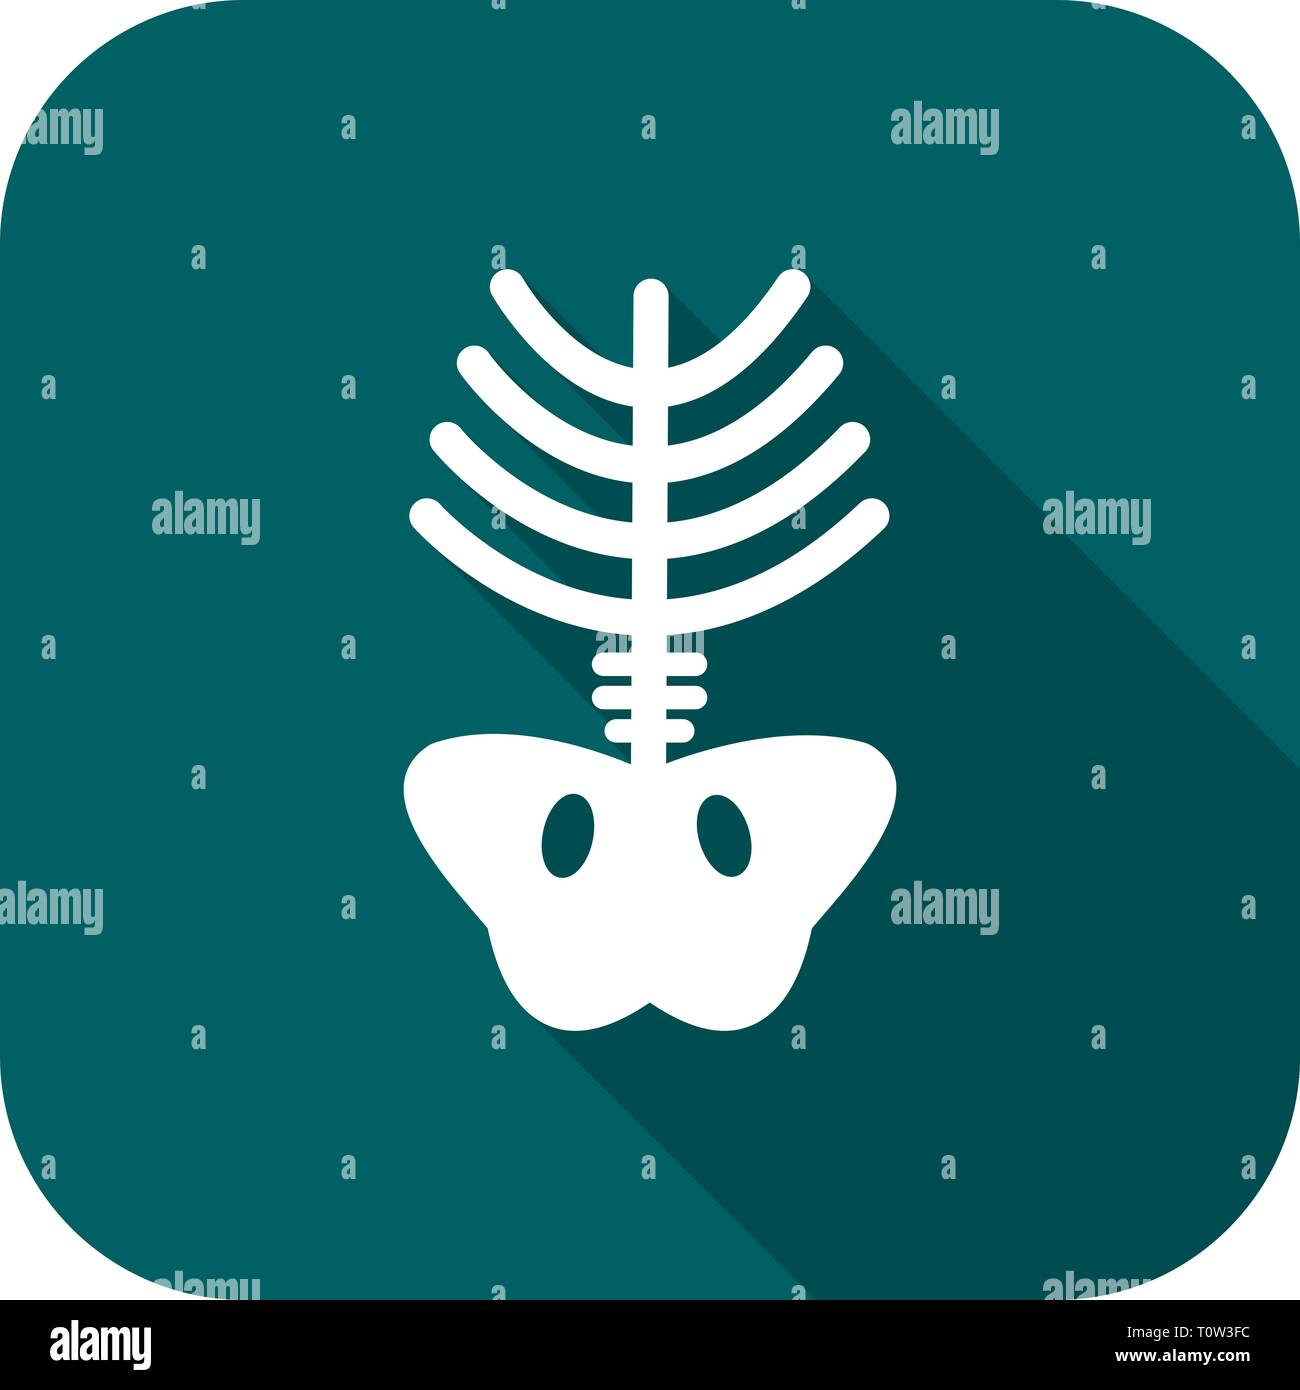 L'icône Illustration Xray Banque D'Images